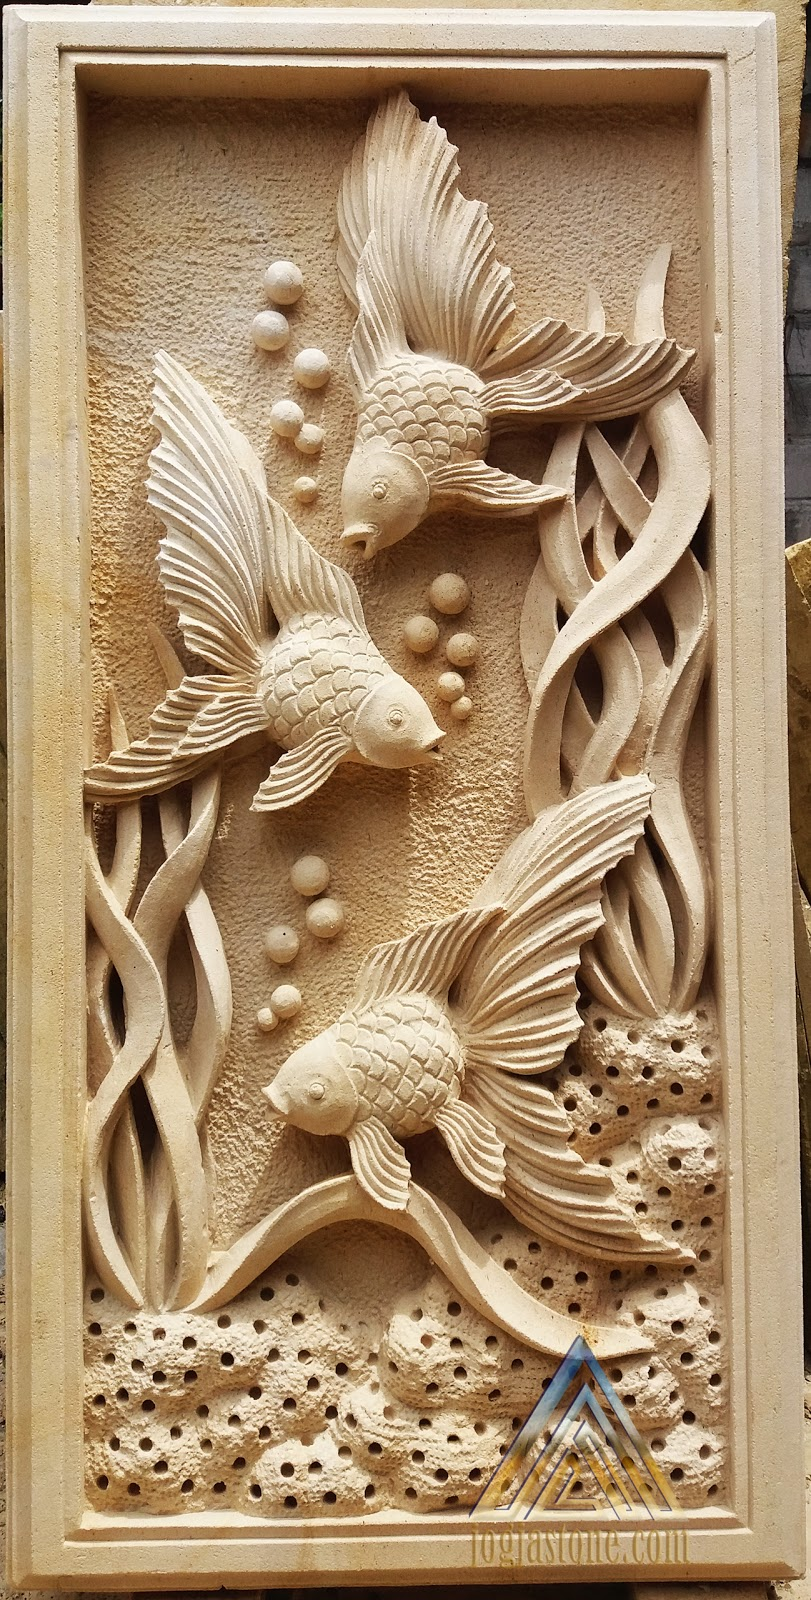 relief ikan hias kerajinan ukir batu alam paras jogja